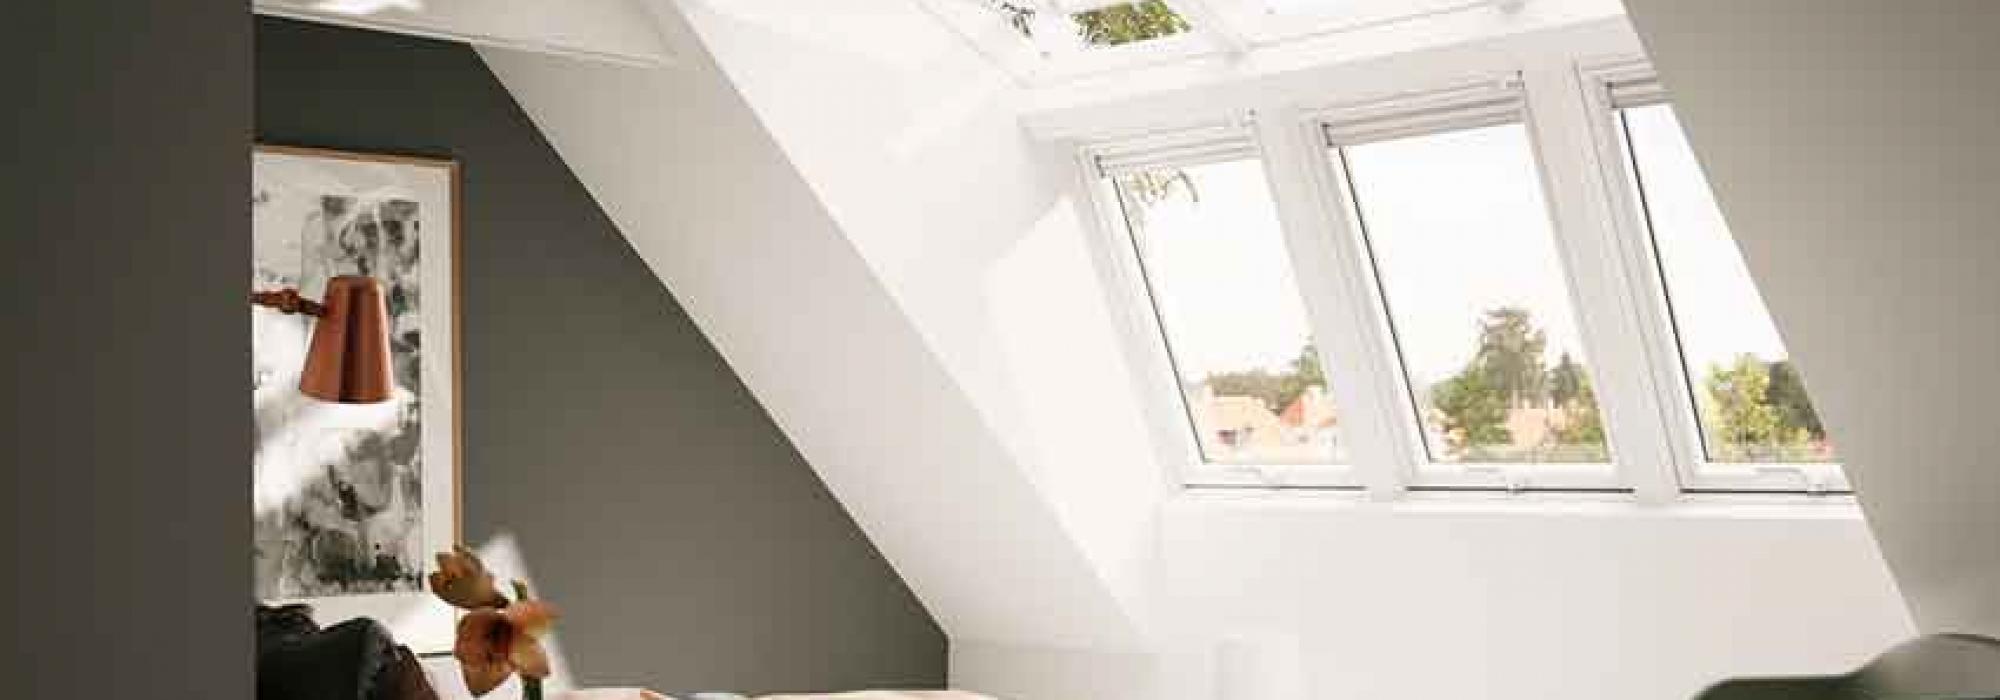 finestre-vasistas-velux